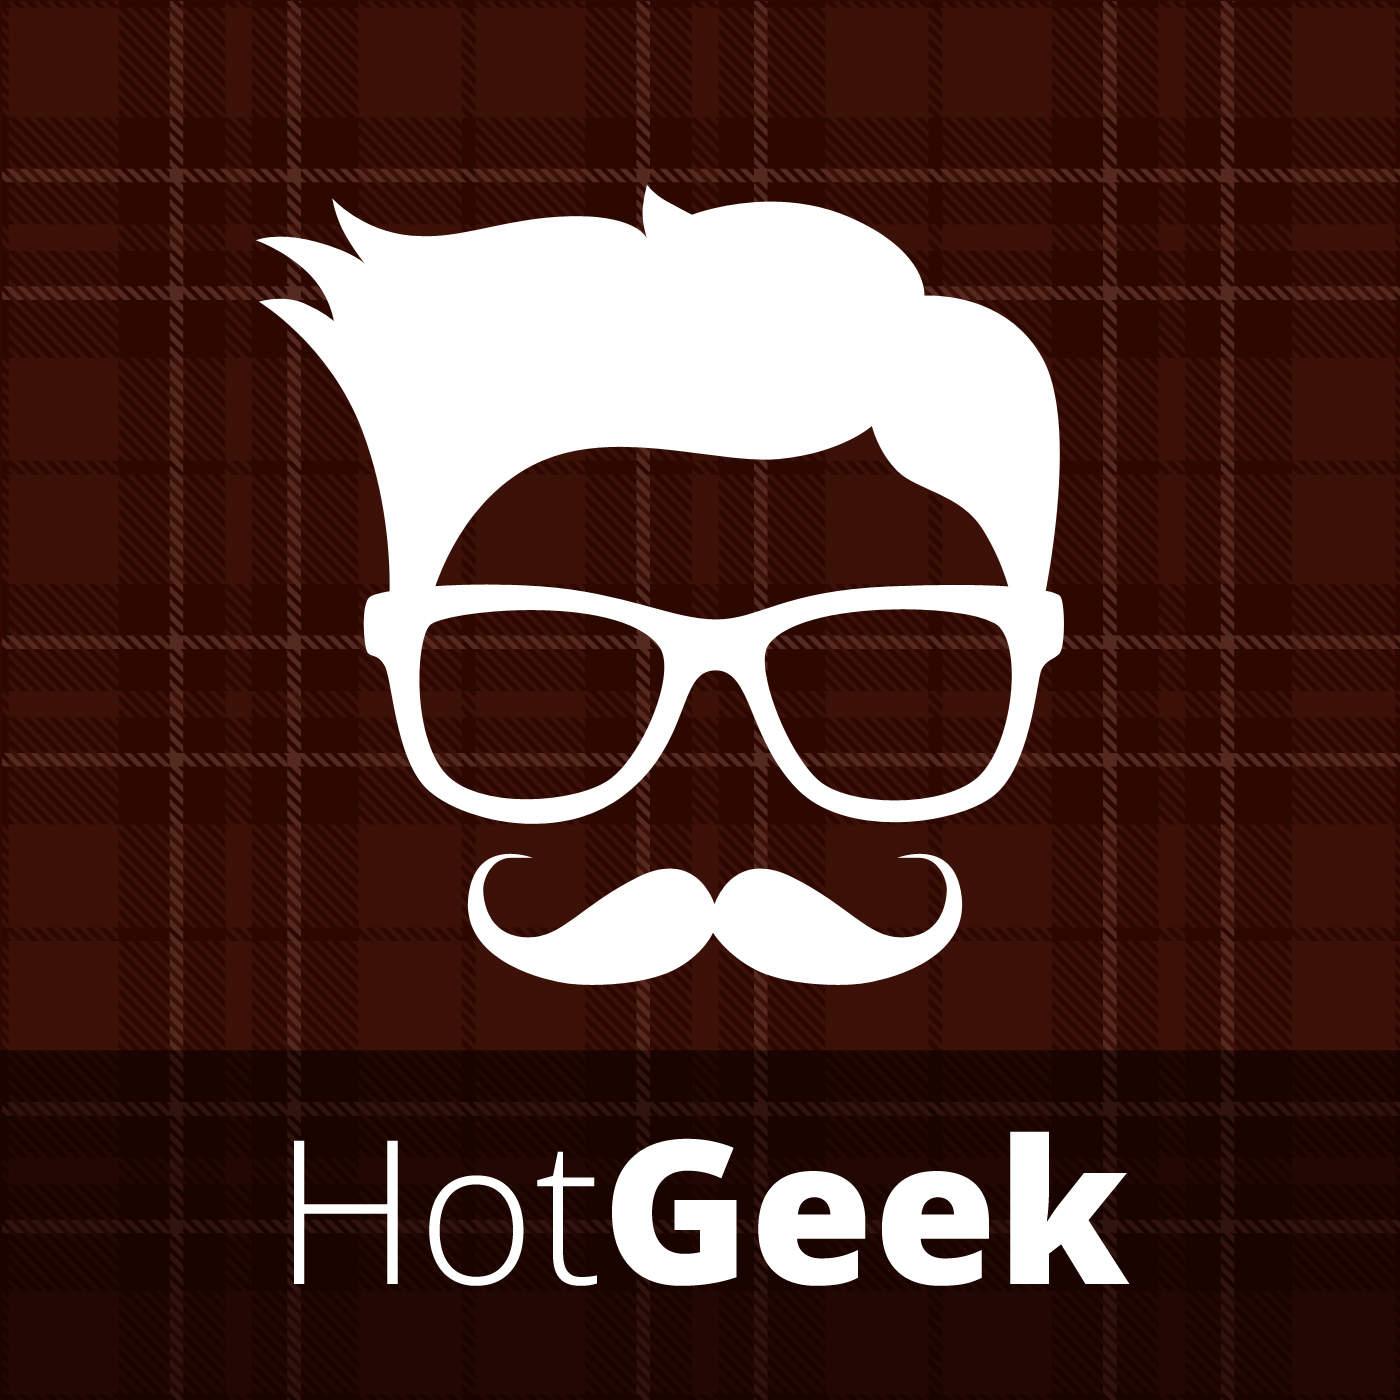 HotGeek